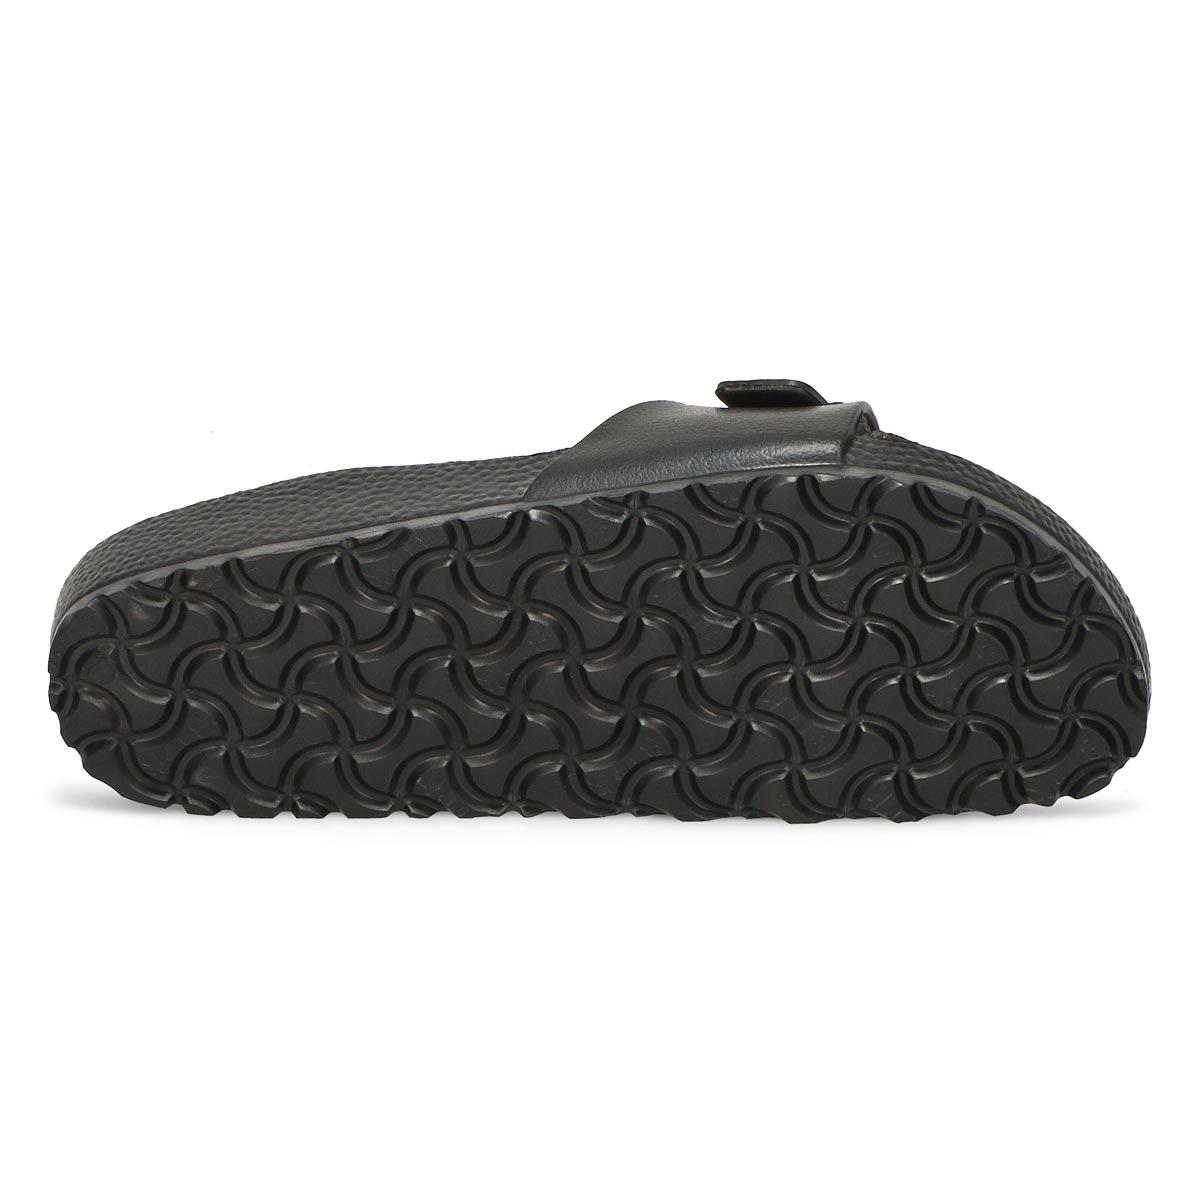 Women's Madrid EVA Narrow Sandal - Black